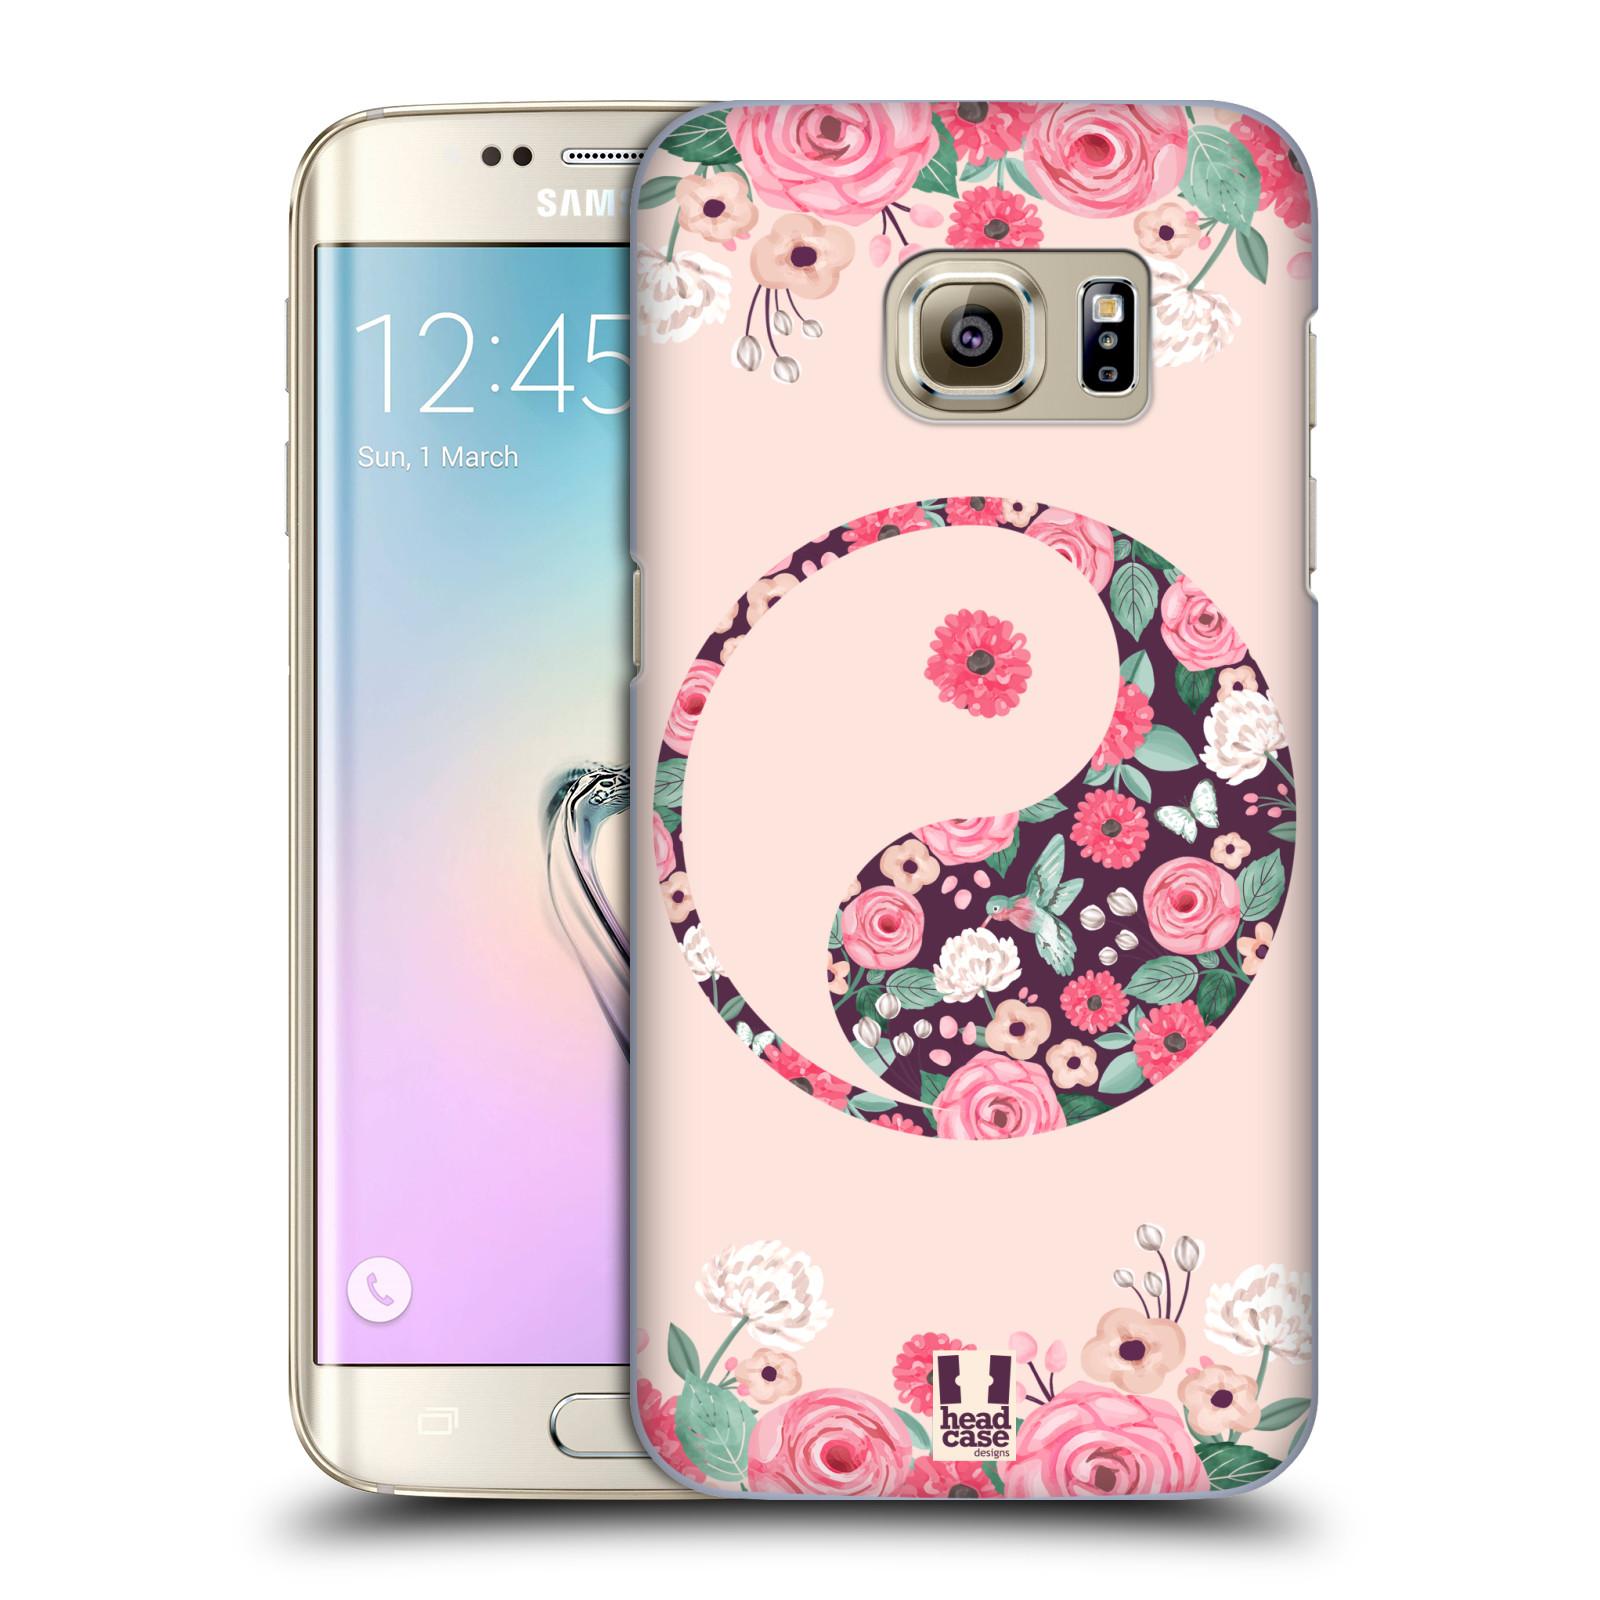 Plastové pouzdro na mobil Samsung Galaxy S7 Edge HEAD CASE Yin a Yang Floral (Kryt či obal na mobilní telefon Samsung Galaxy S7 Edge SM-G935F)